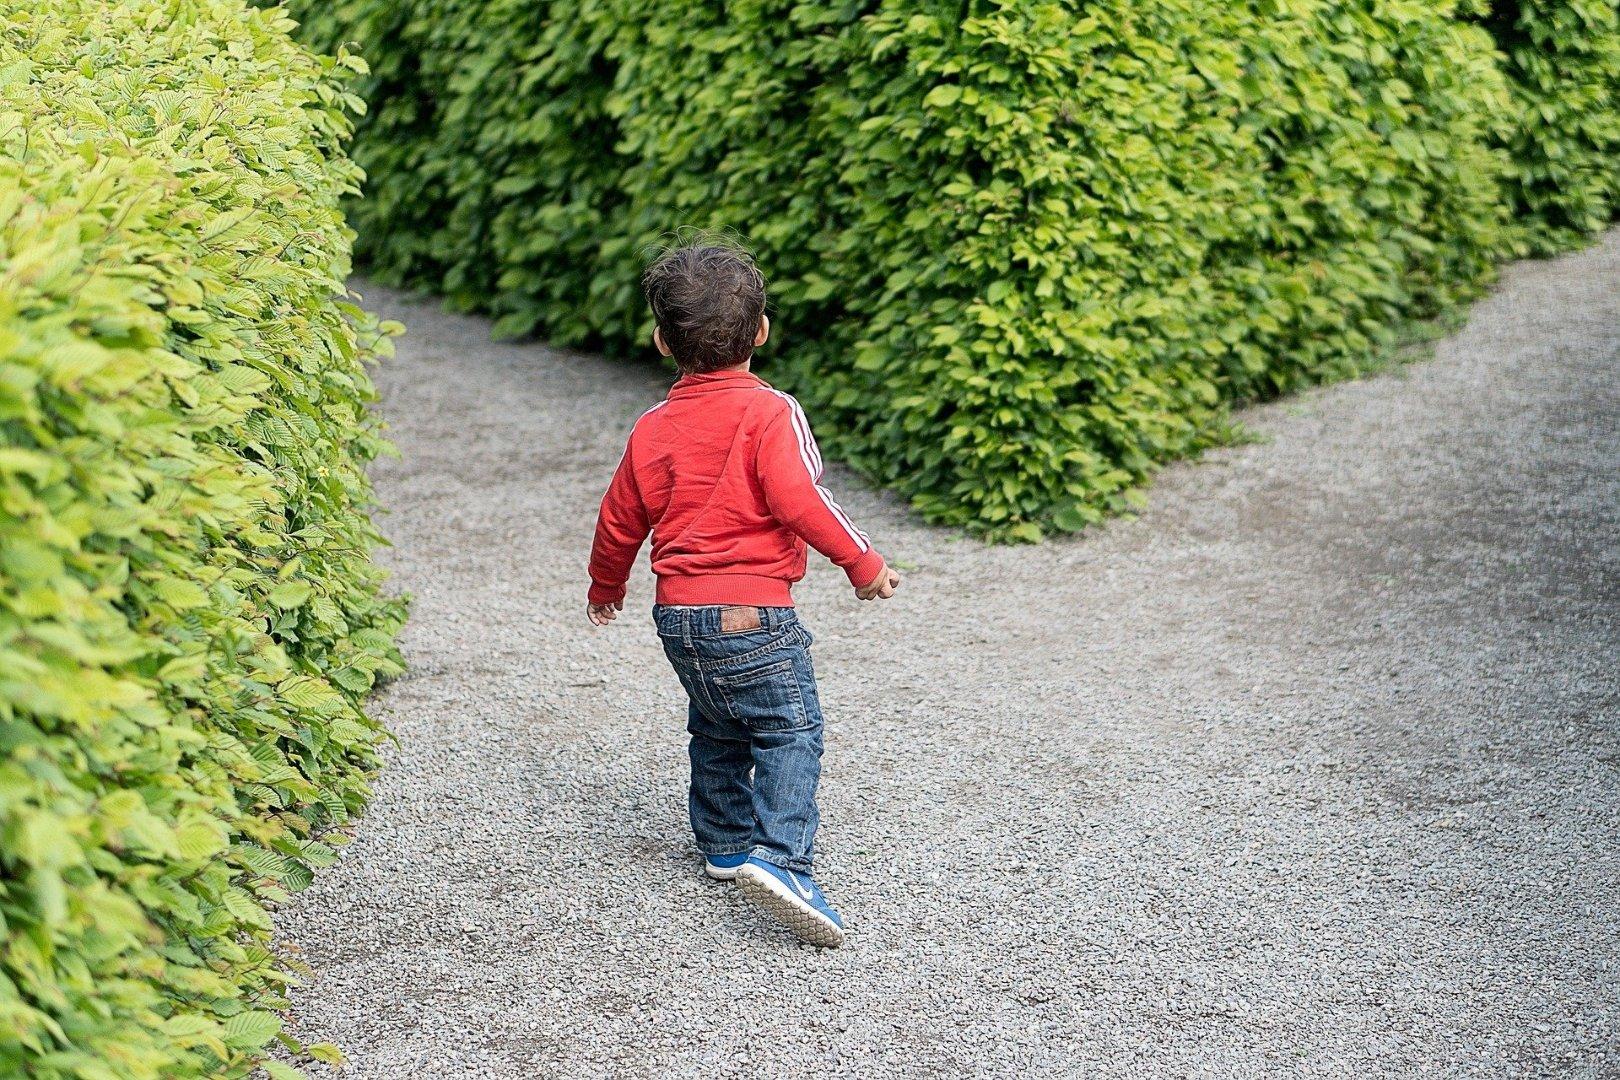 little boy running toward a fork in the road